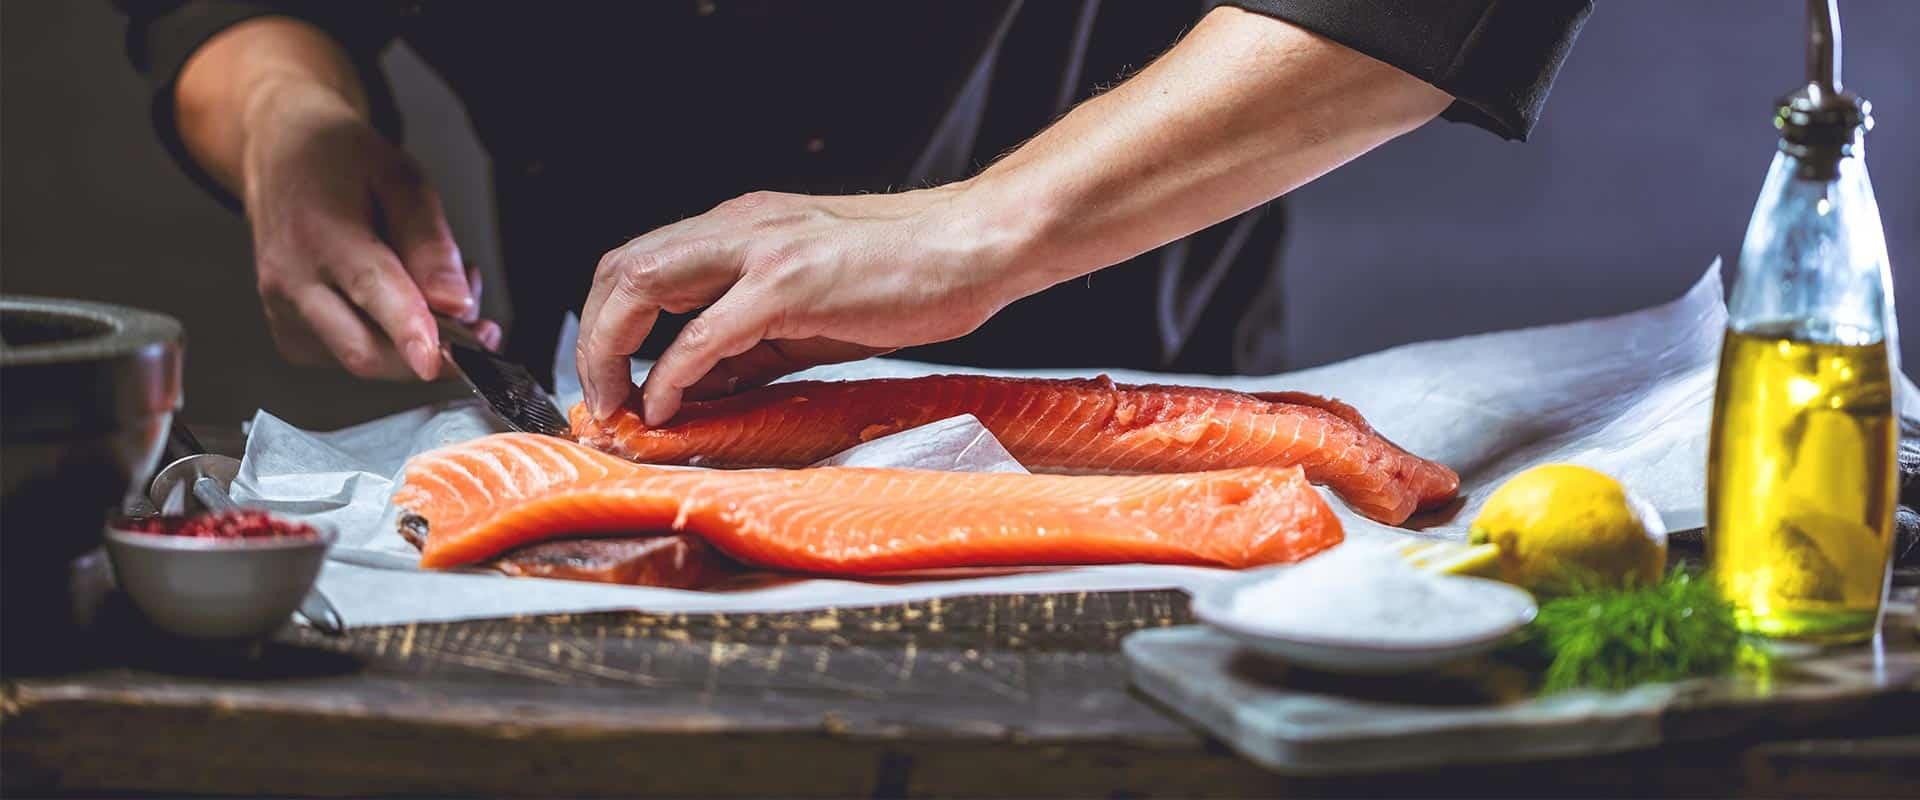 Salmon knife knife sales Rottner